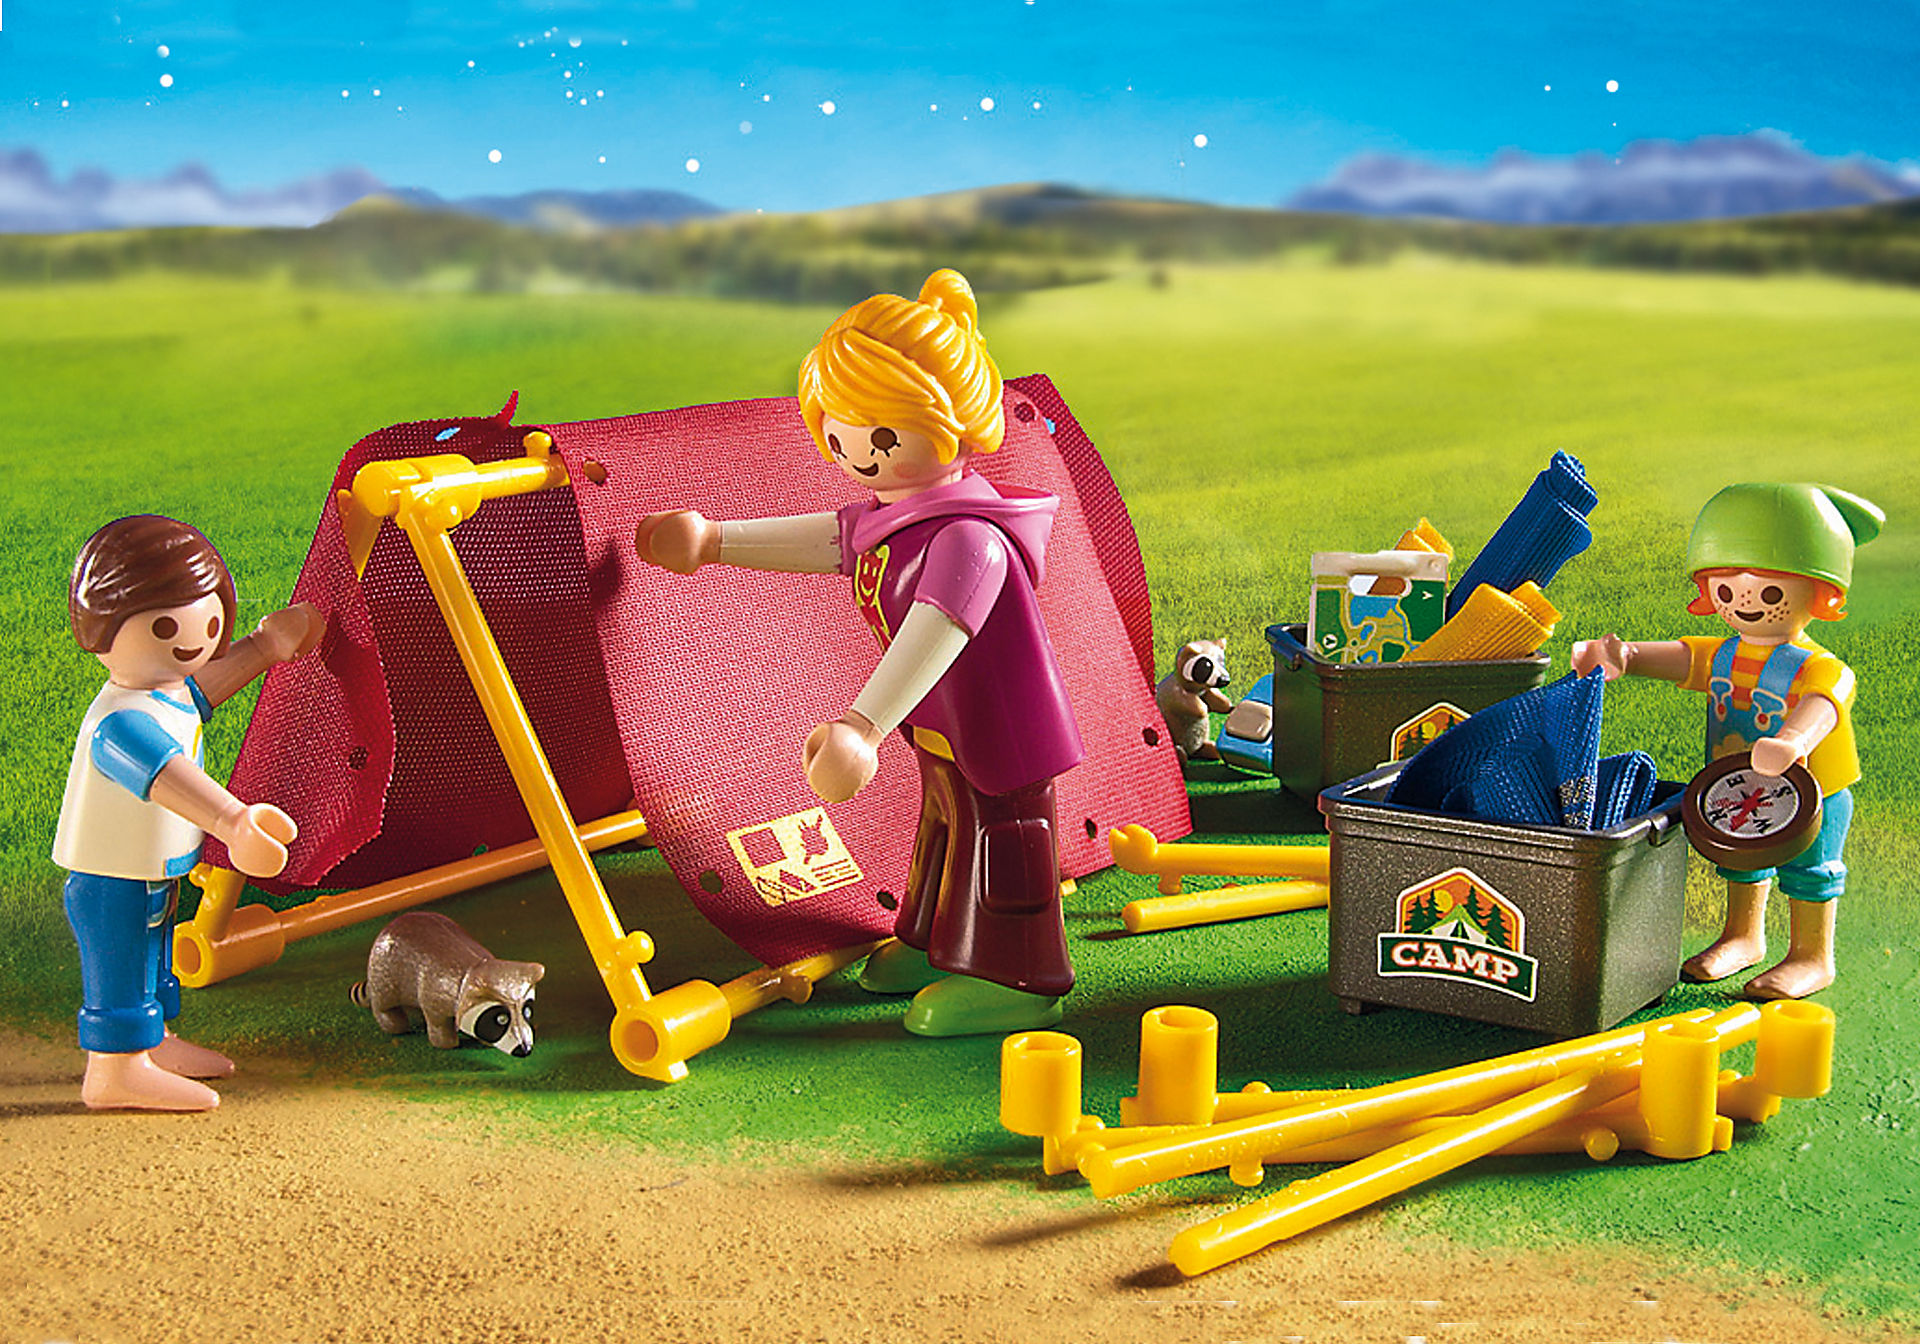 http://media.playmobil.com/i/playmobil/6888_product_extra2/Tentes avec enfants et animatrice